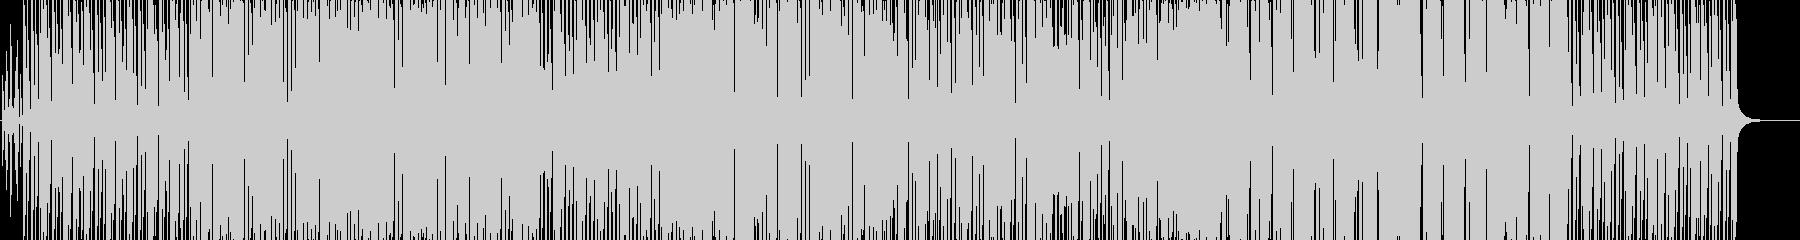 POP♬-EDM-TikTok-カワイイの未再生の波形